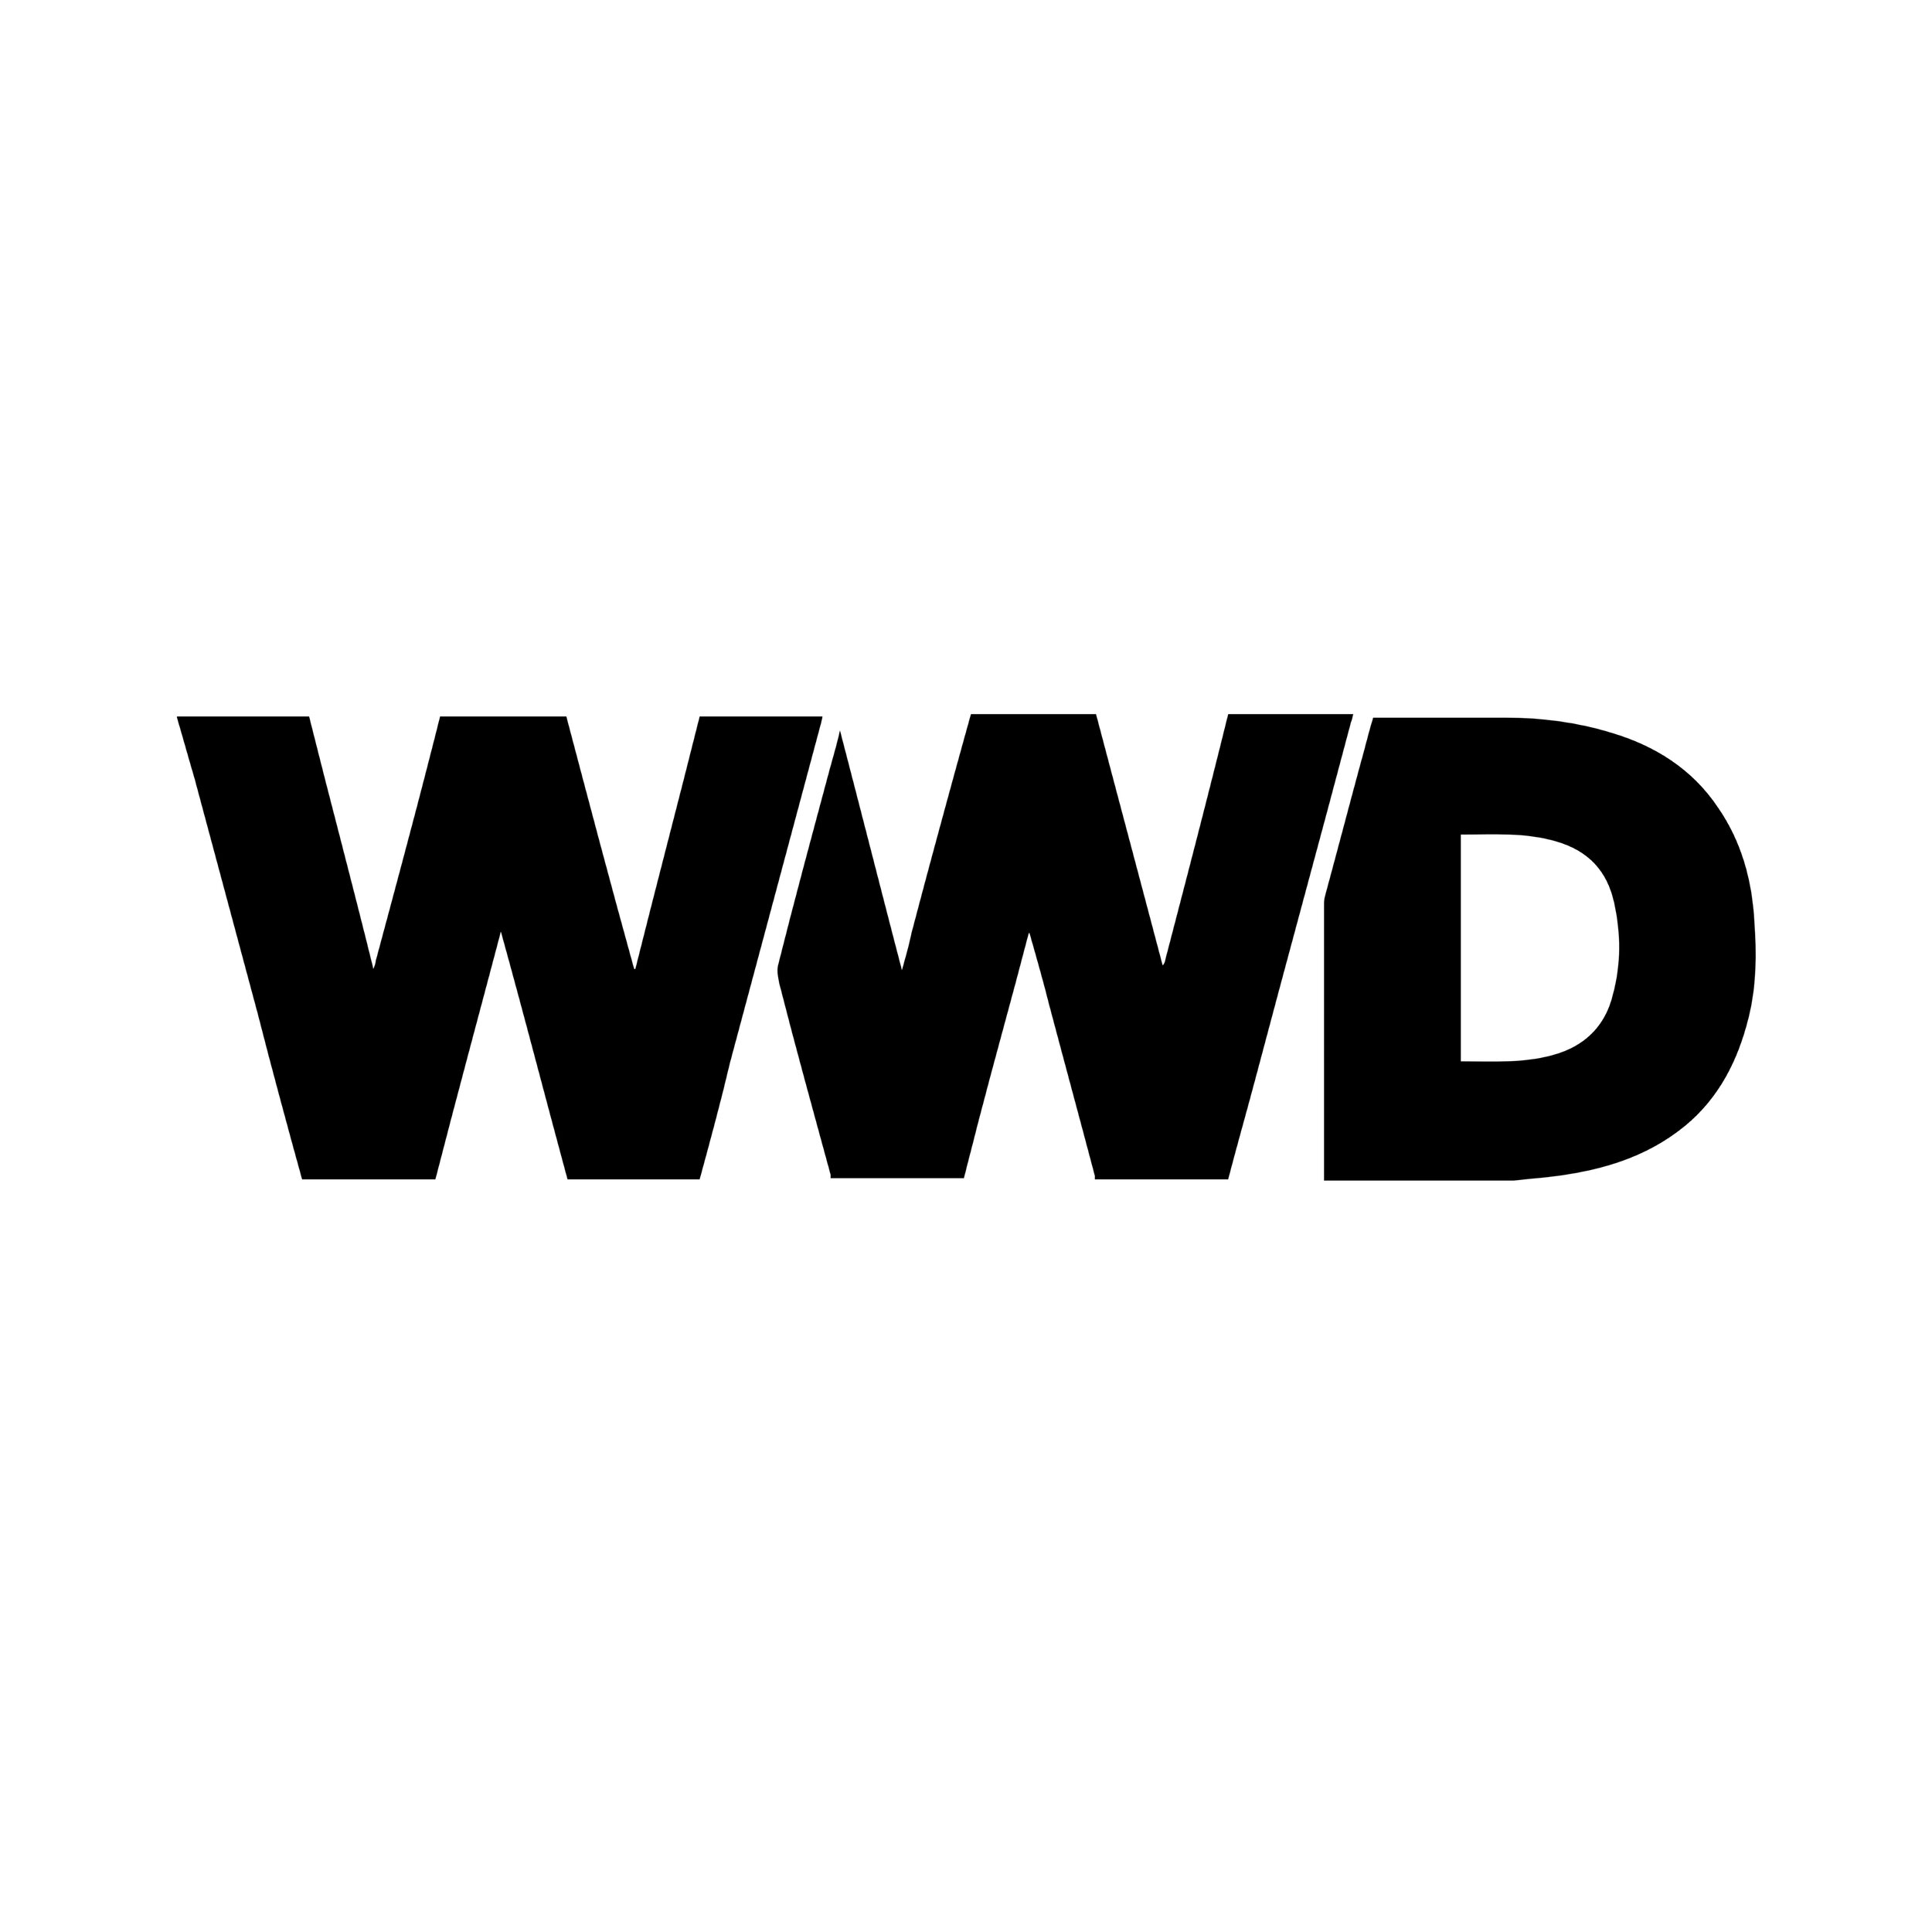 WWD_logo_logotype.jpg